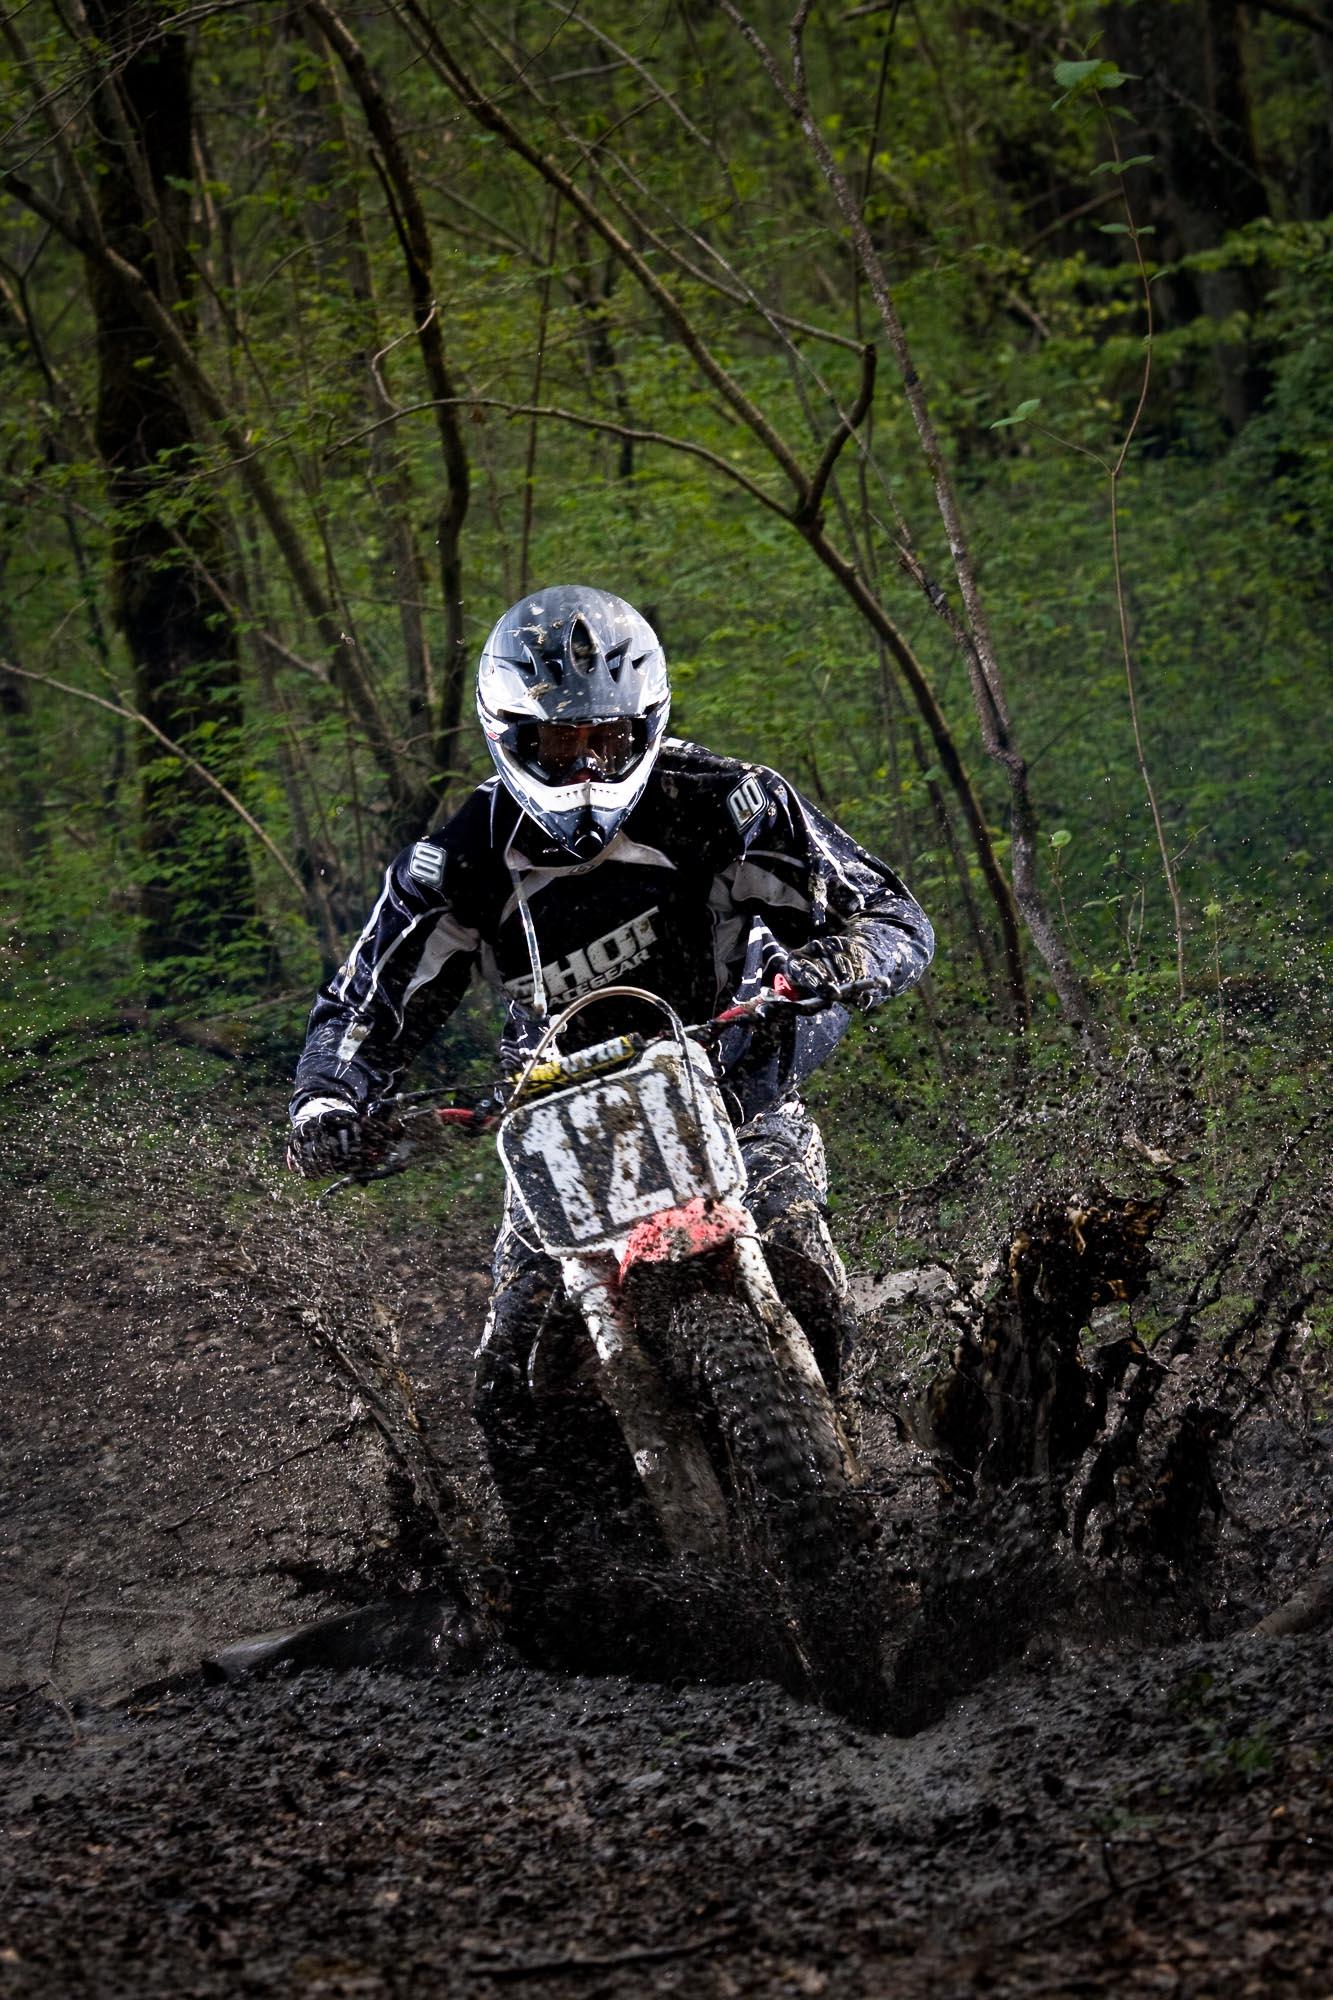 20100425-motos yvoire-10.jpg